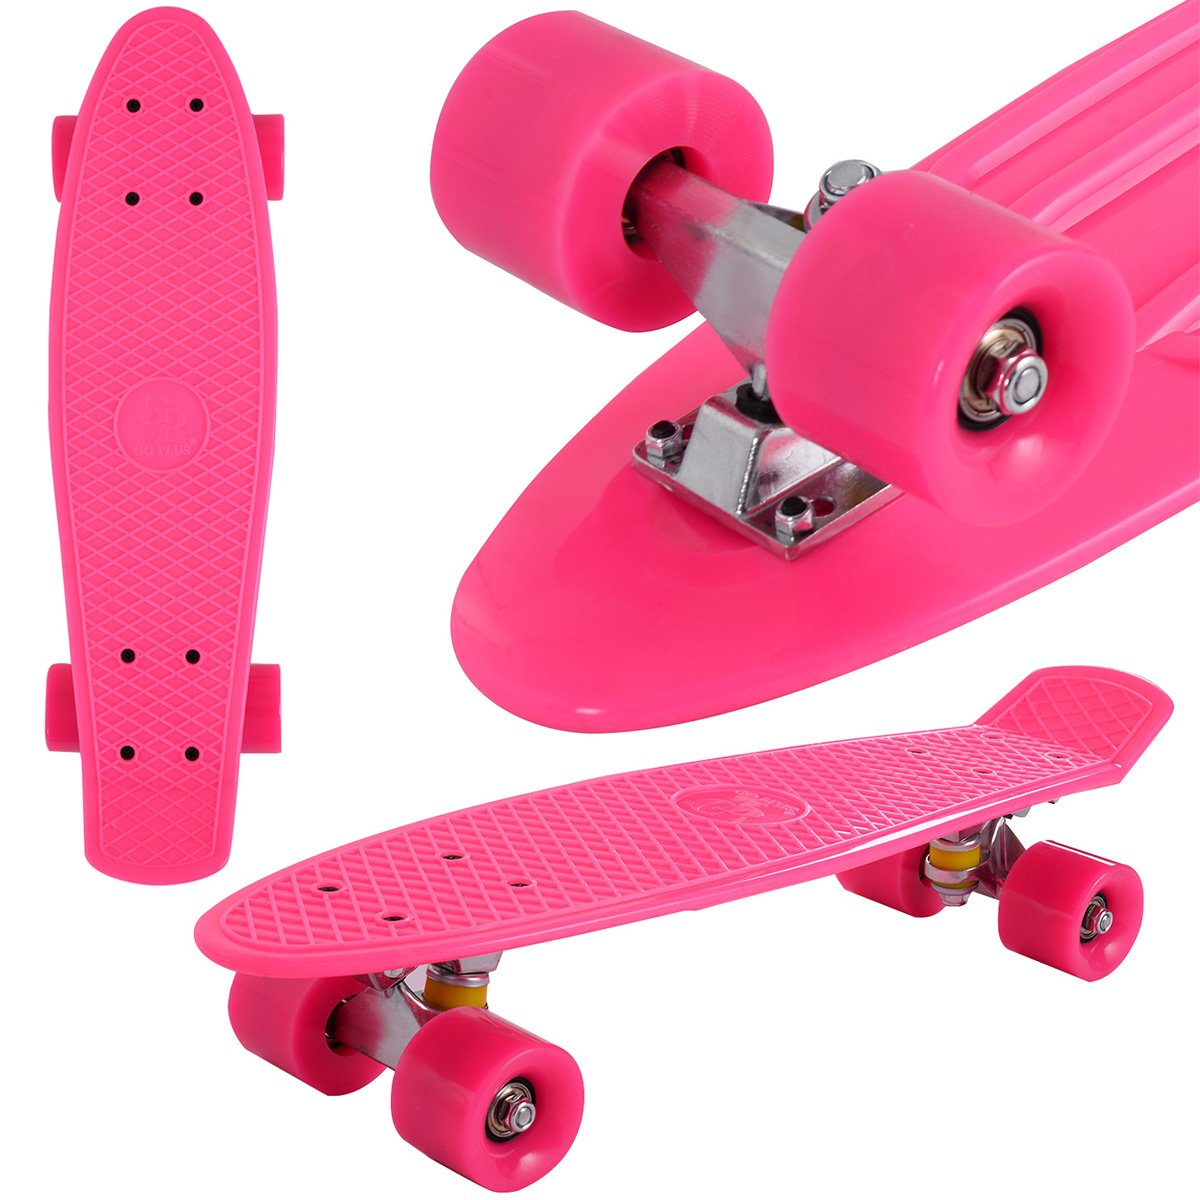 COSTWAY Skateboard Komplett Retro Skate Board Mini Funboard Minicruiser ABEC 7 Farbenwahlen (Rosa)